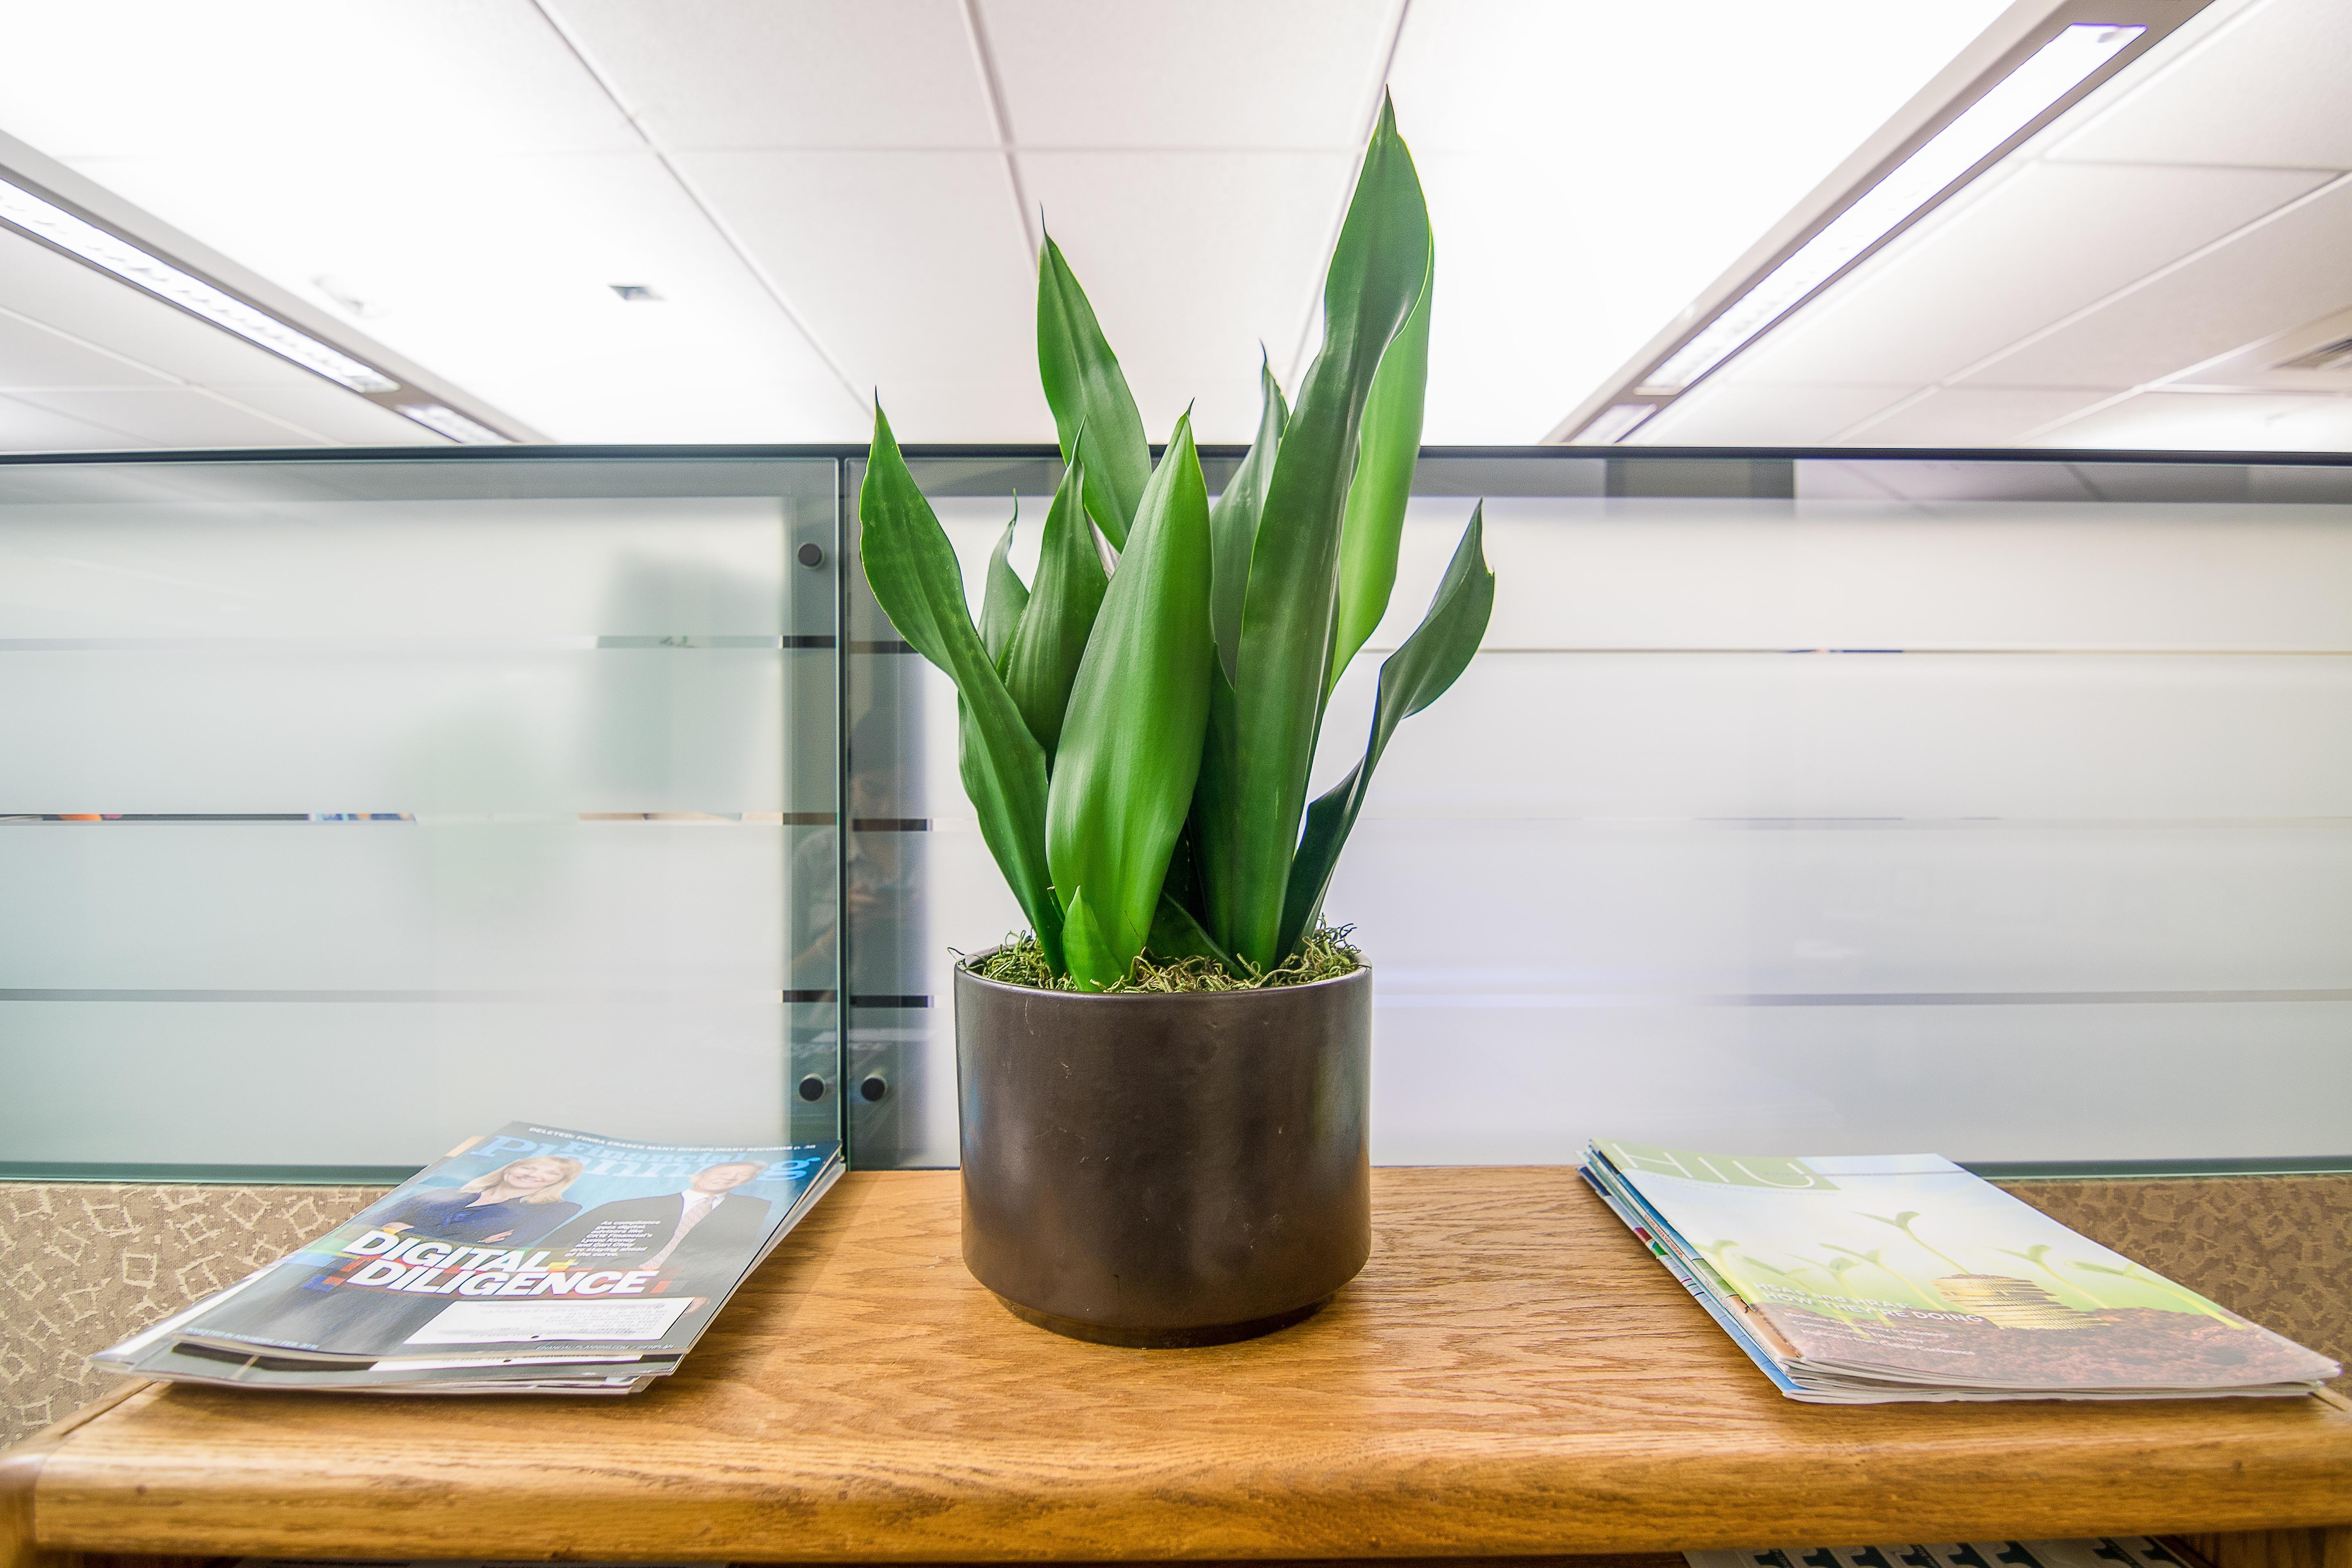 AJG_Sanseveria plant